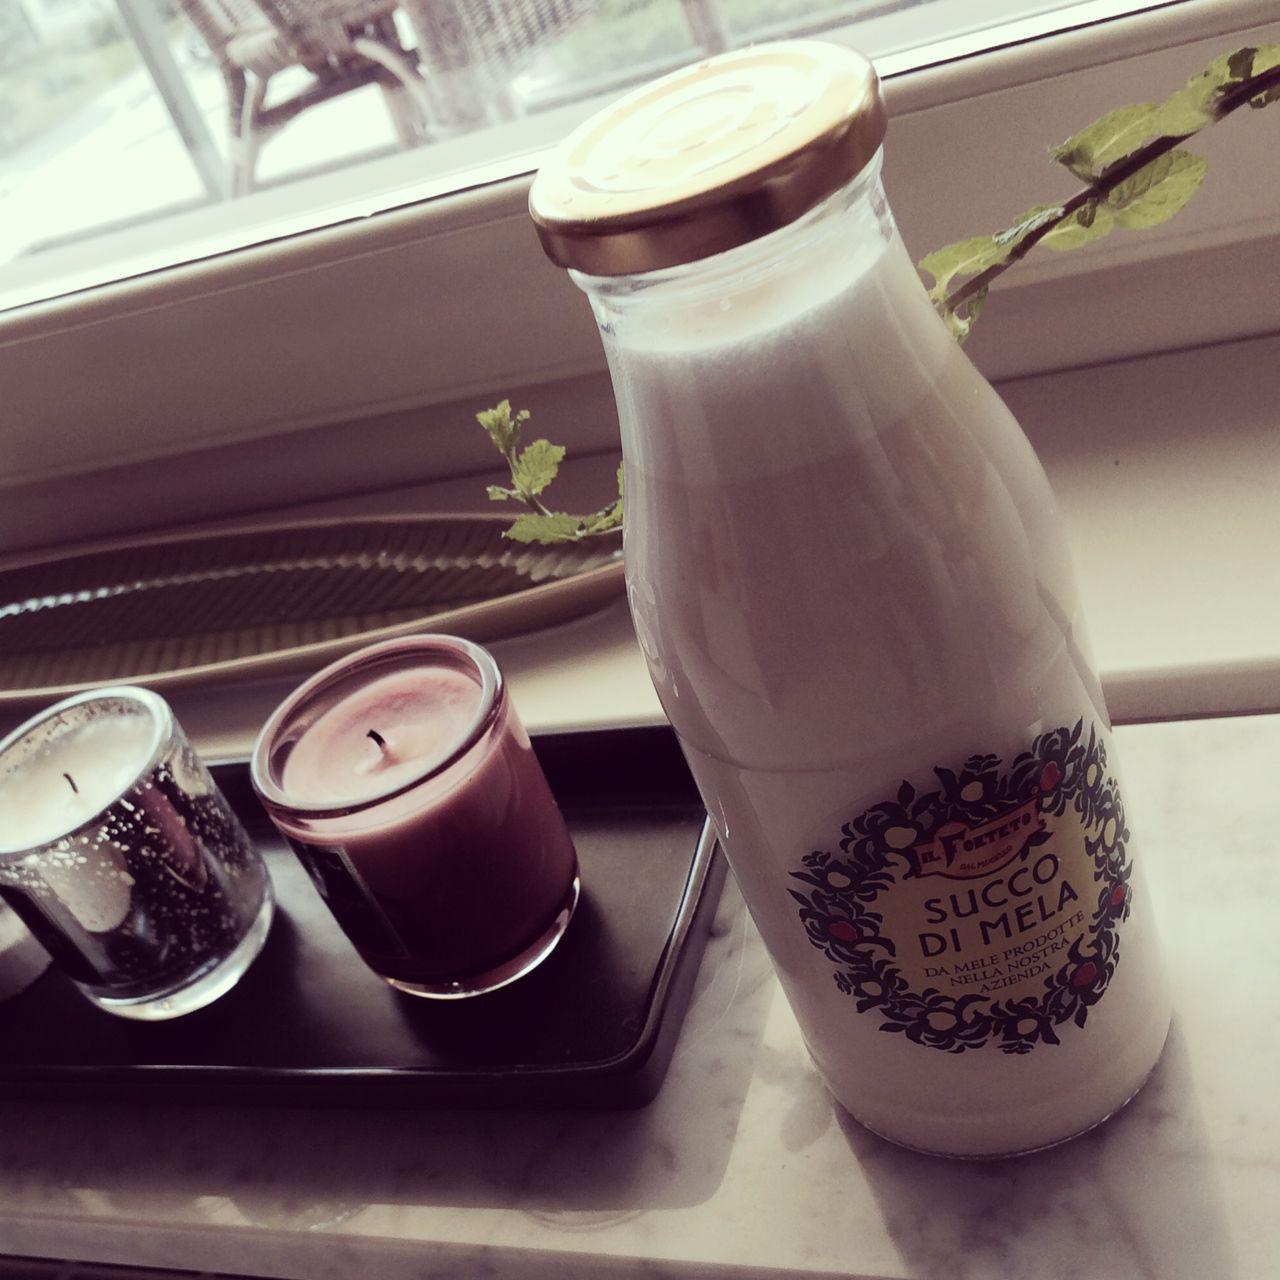 Mandelmjölk